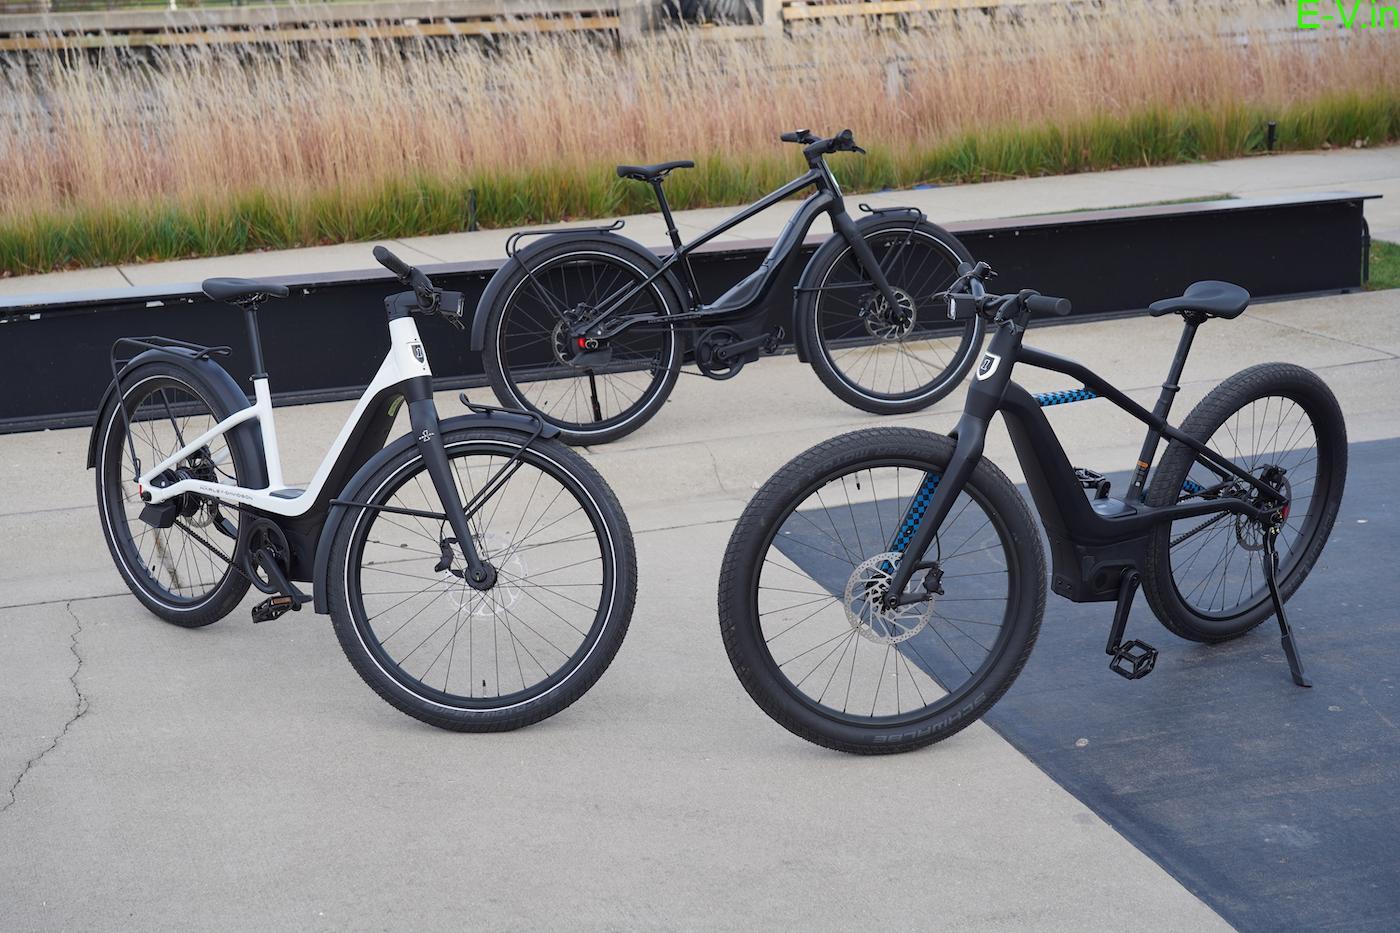 Harley deploys serial 1 electric bikes in Europe & North America